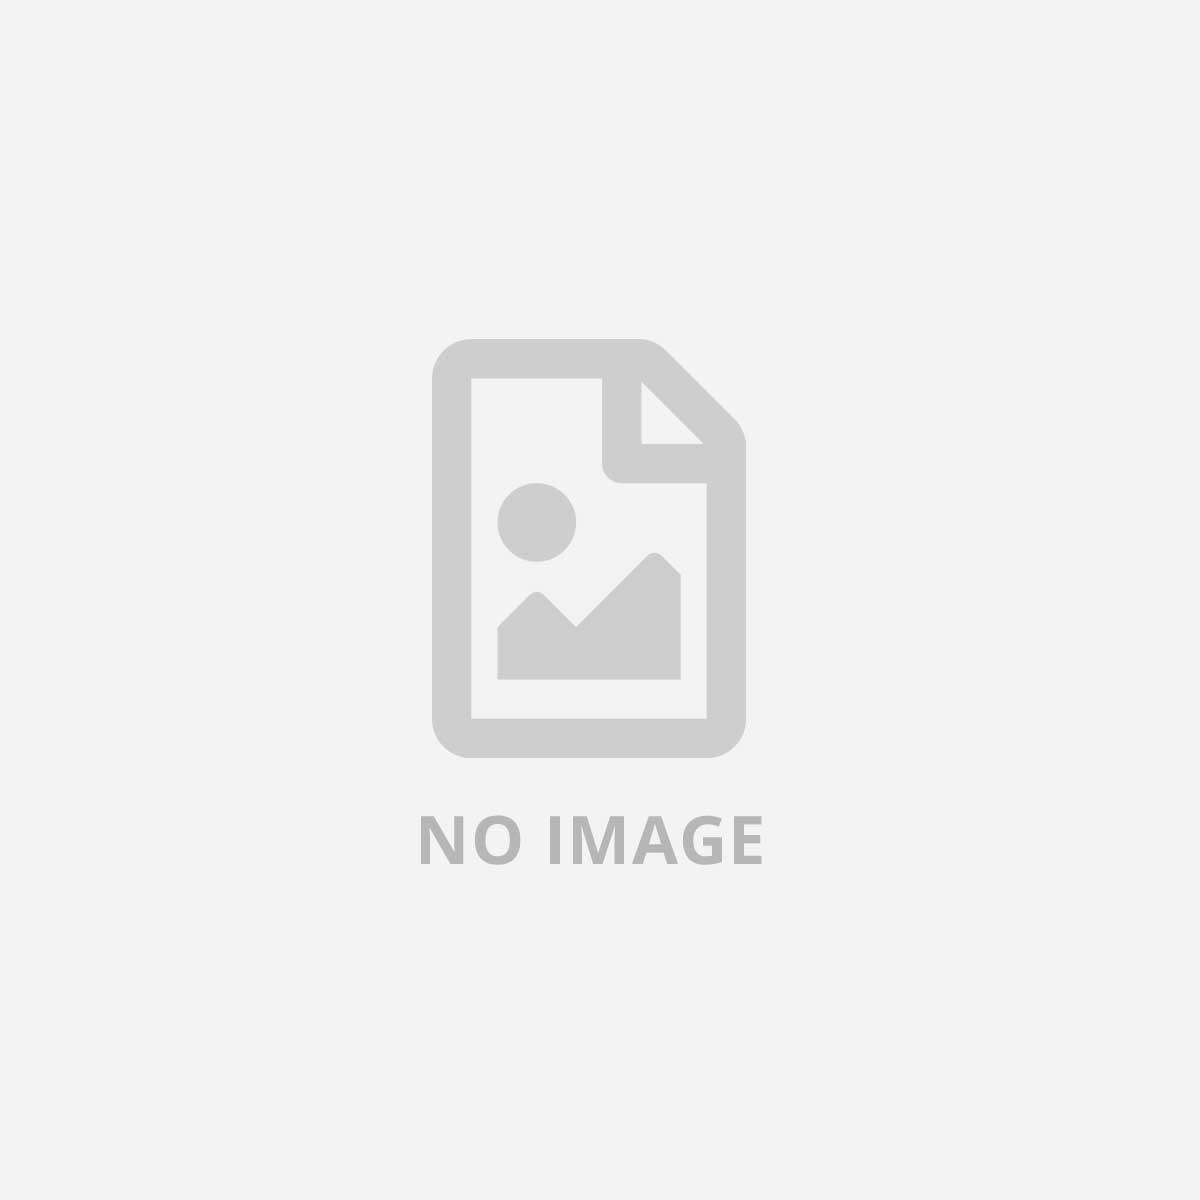 VERBATIM HD USB 3.0-500GB-2.5 SMARTDISK